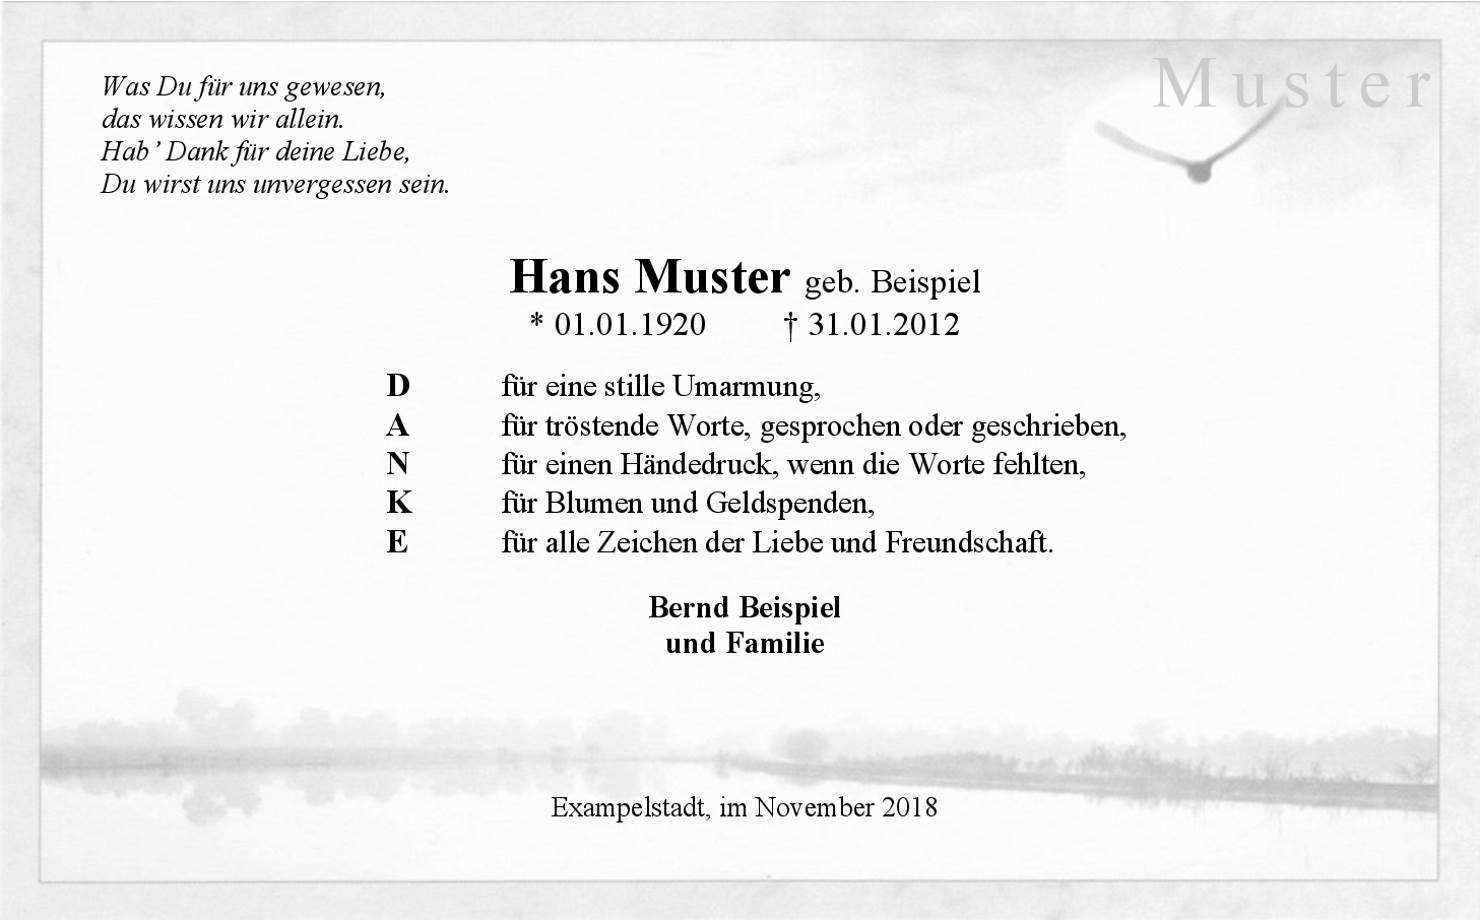 Trauer Danksagungskarte Vogel Am Fluss Danke Danke Sagen Danksagung Text Trostende Worte